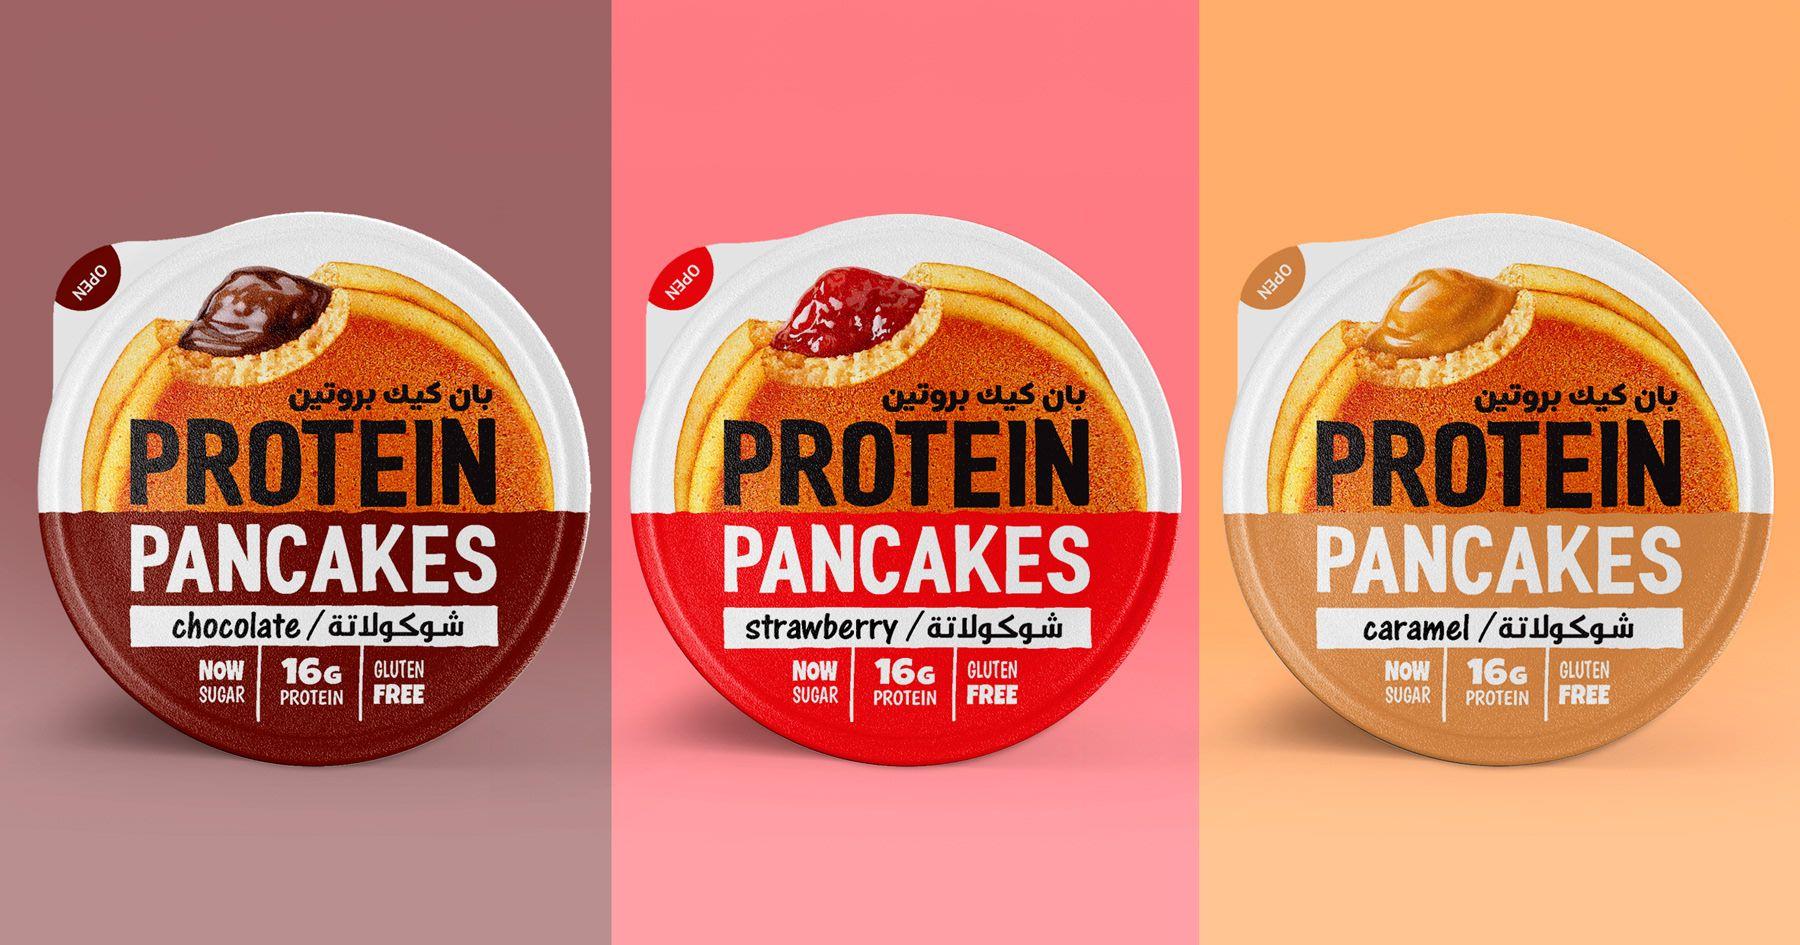 Design Of Protein Pancakes Tm Amalfi Food Bahrain On Behance Protein Pancakes Pancakes Protein